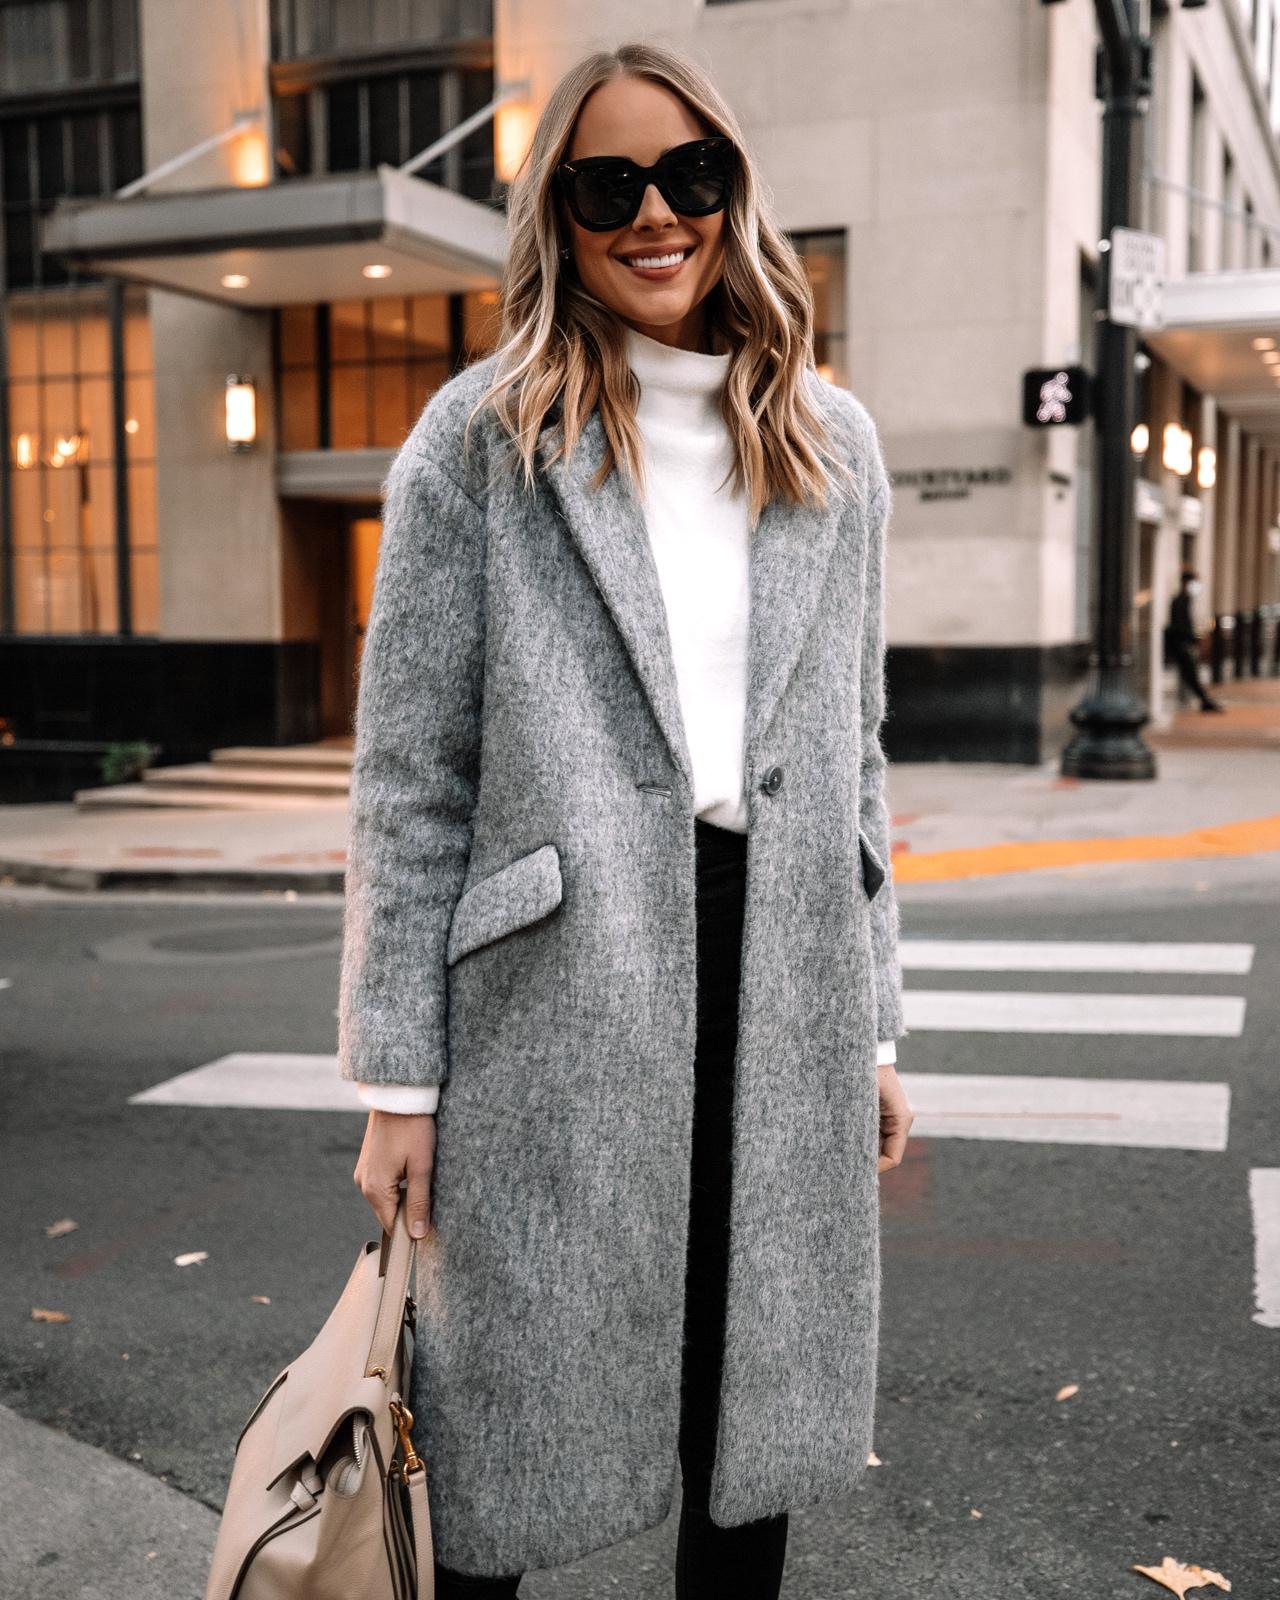 Fashion Jackson Wearing Express Grey Wool Coat White Sweater Winter Outfit